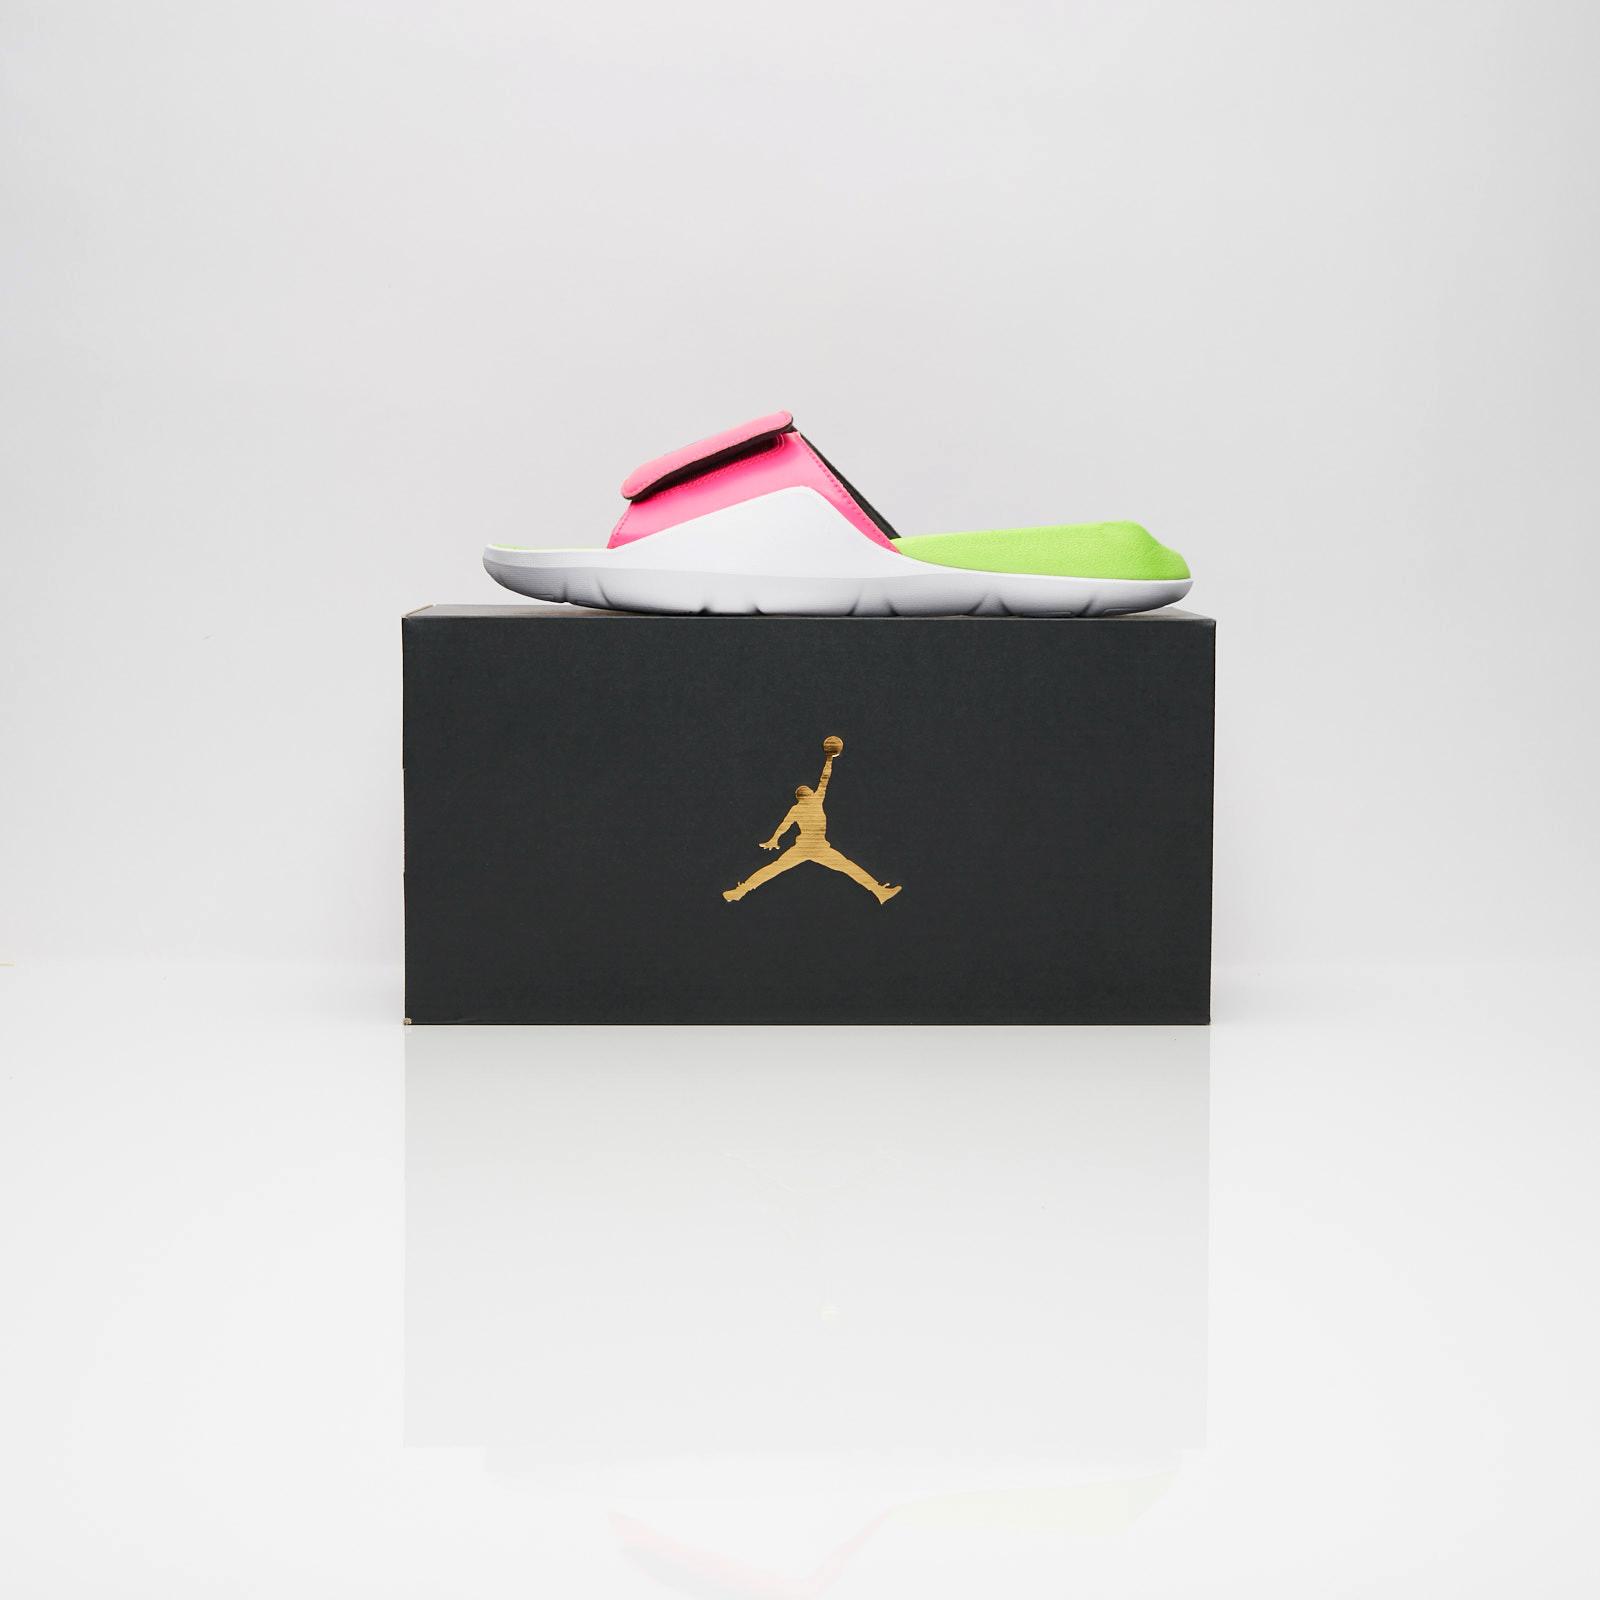 898a72d1d201 Jordan Brand Jordan Hydro 7 Q54 - At9193-600 - Sneakersnstuff ...